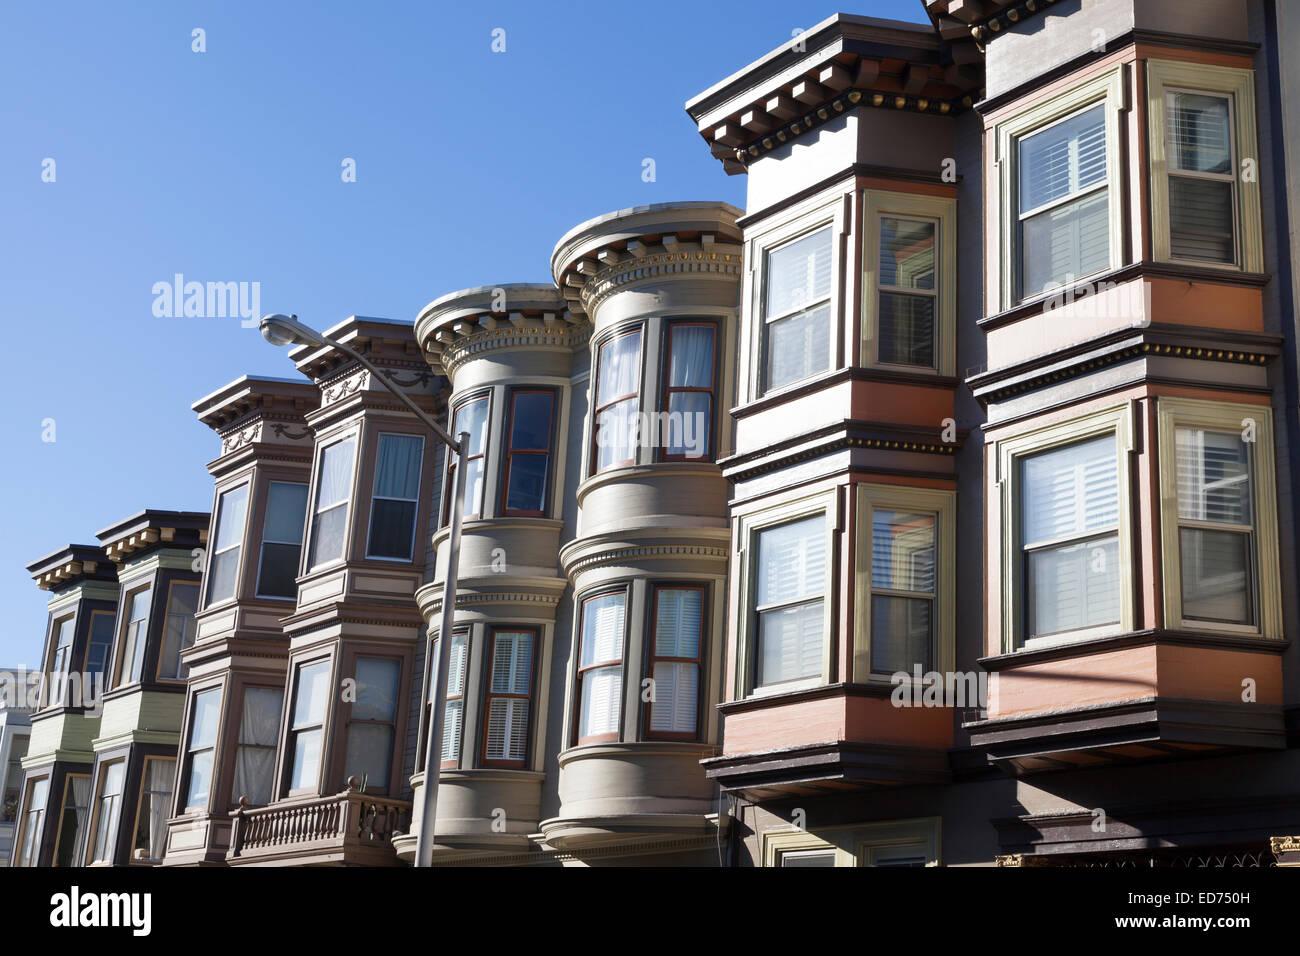 Rows of bay windows along Stockton Street in North Beach - San Francisco, San Francisco County, California, USA - Stock Image